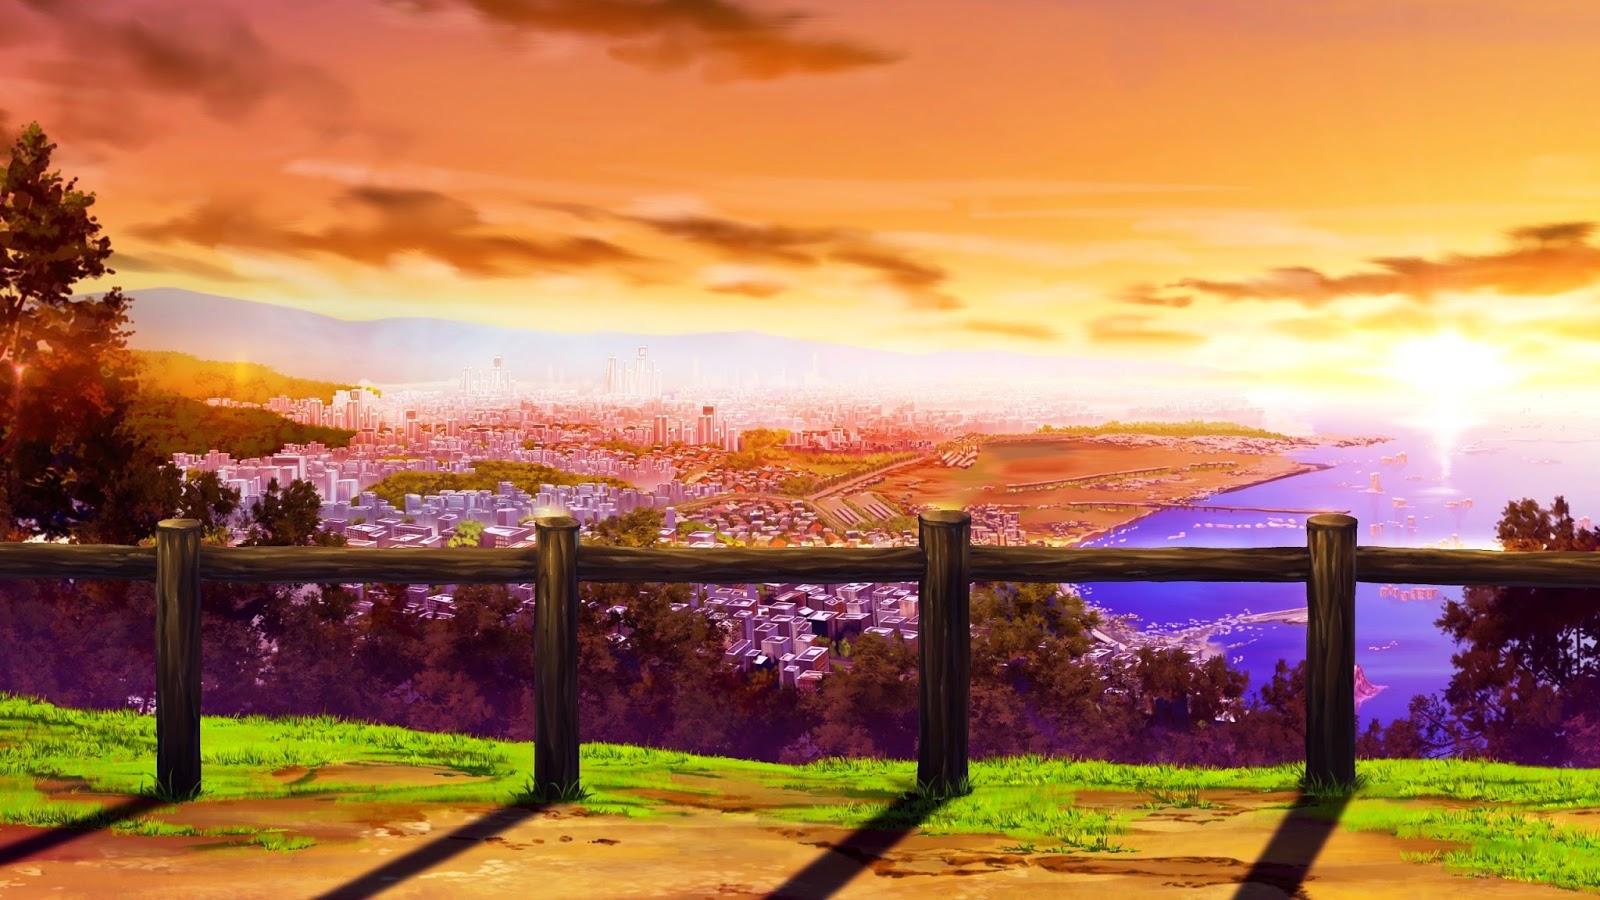 Fondo Animado Campo Parque Full Hd Animate Background: Spring Backgrounds Nature